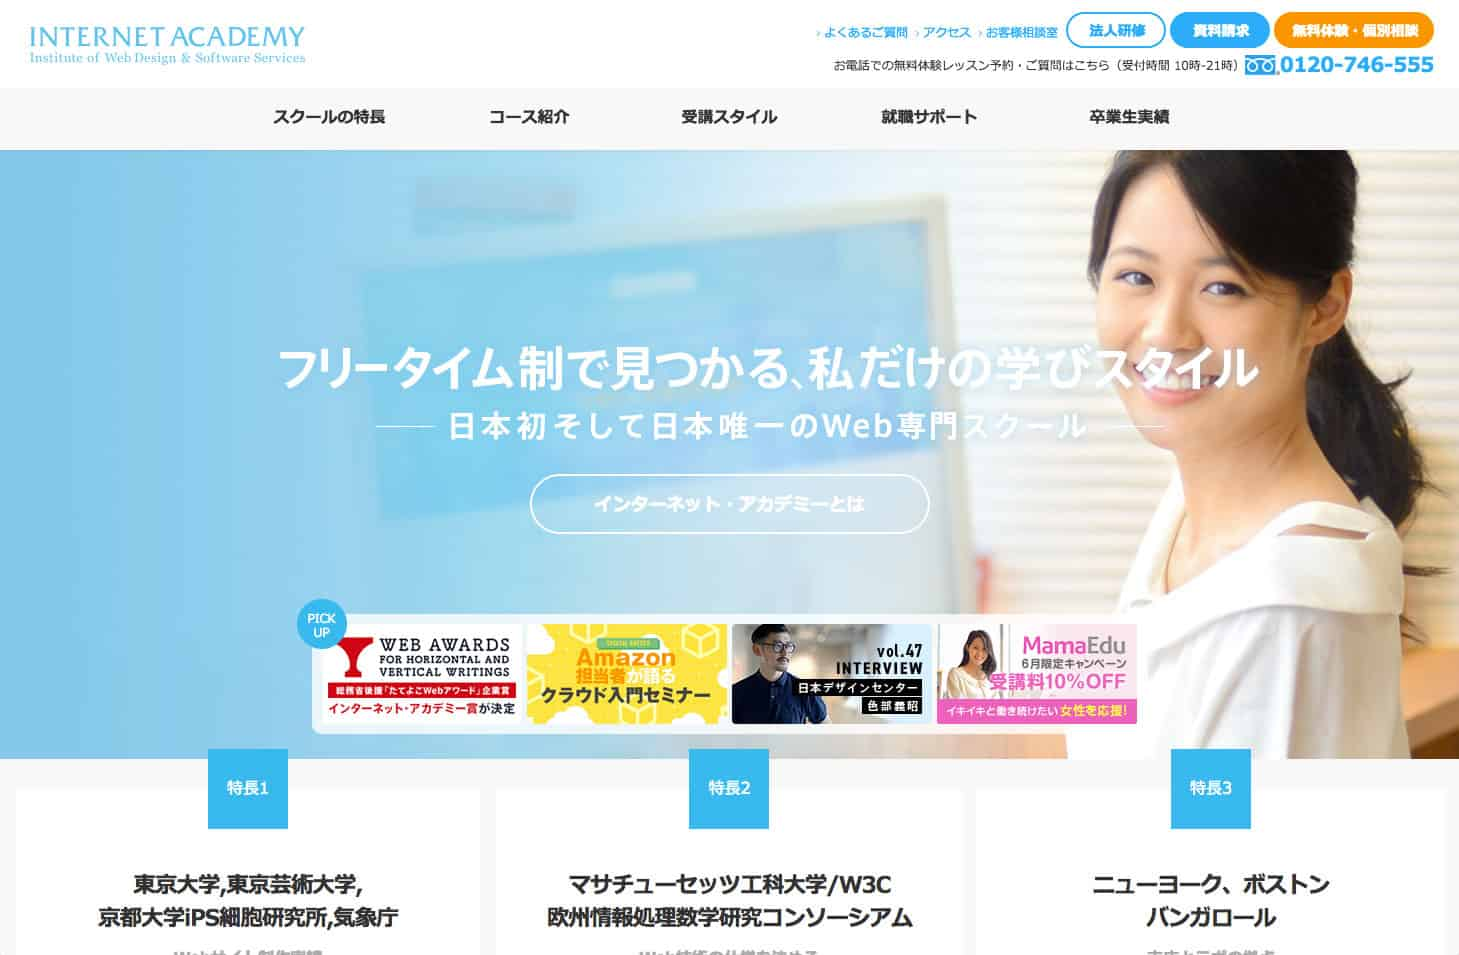 INTERNET ACADEMY(インターネット・アカデミー)